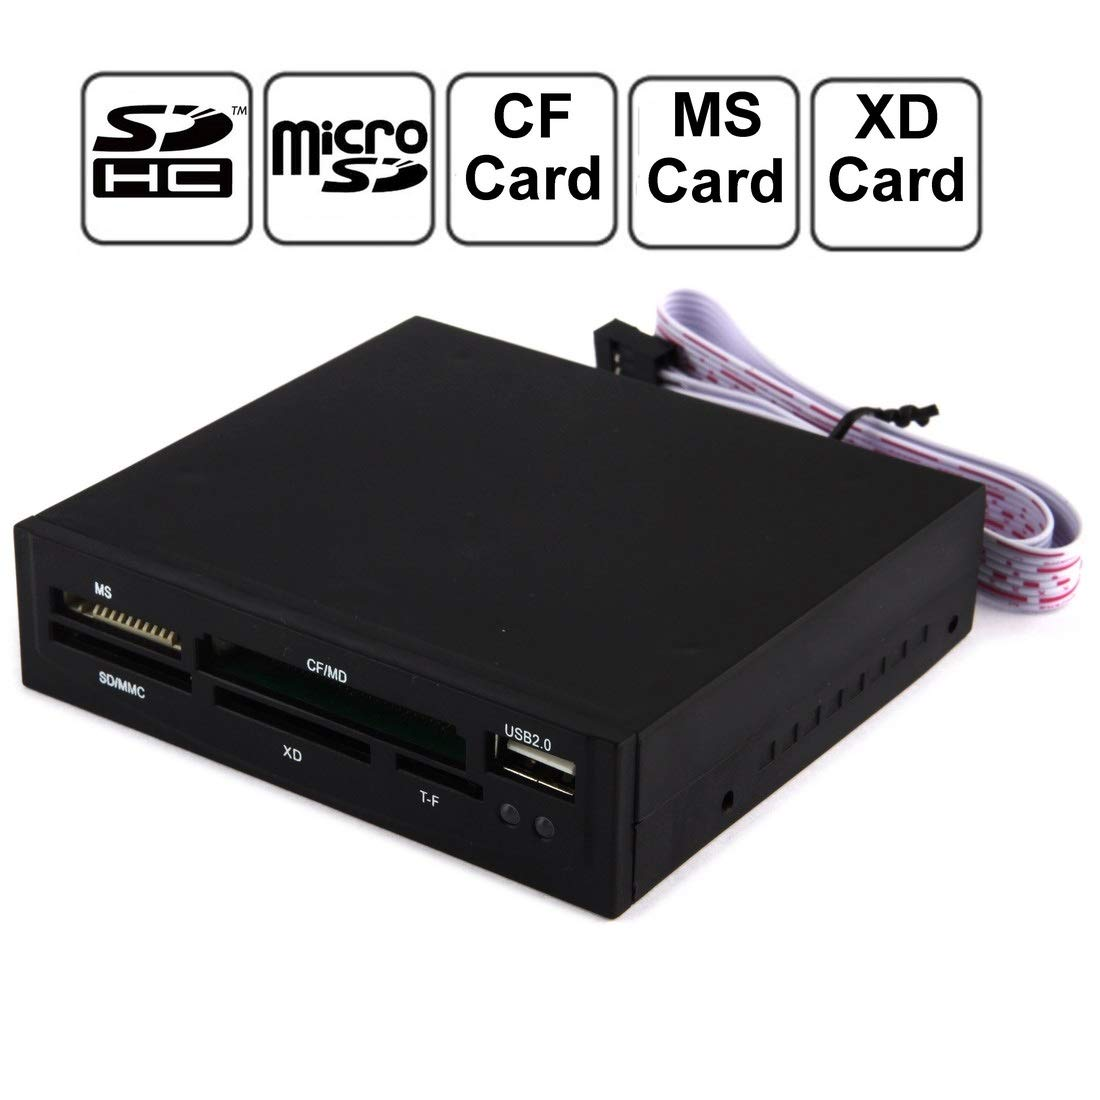 1 Tarjeta de Memoria Interna XD/SD/MMC/T-Flash/MS Pro Duo/CF ...